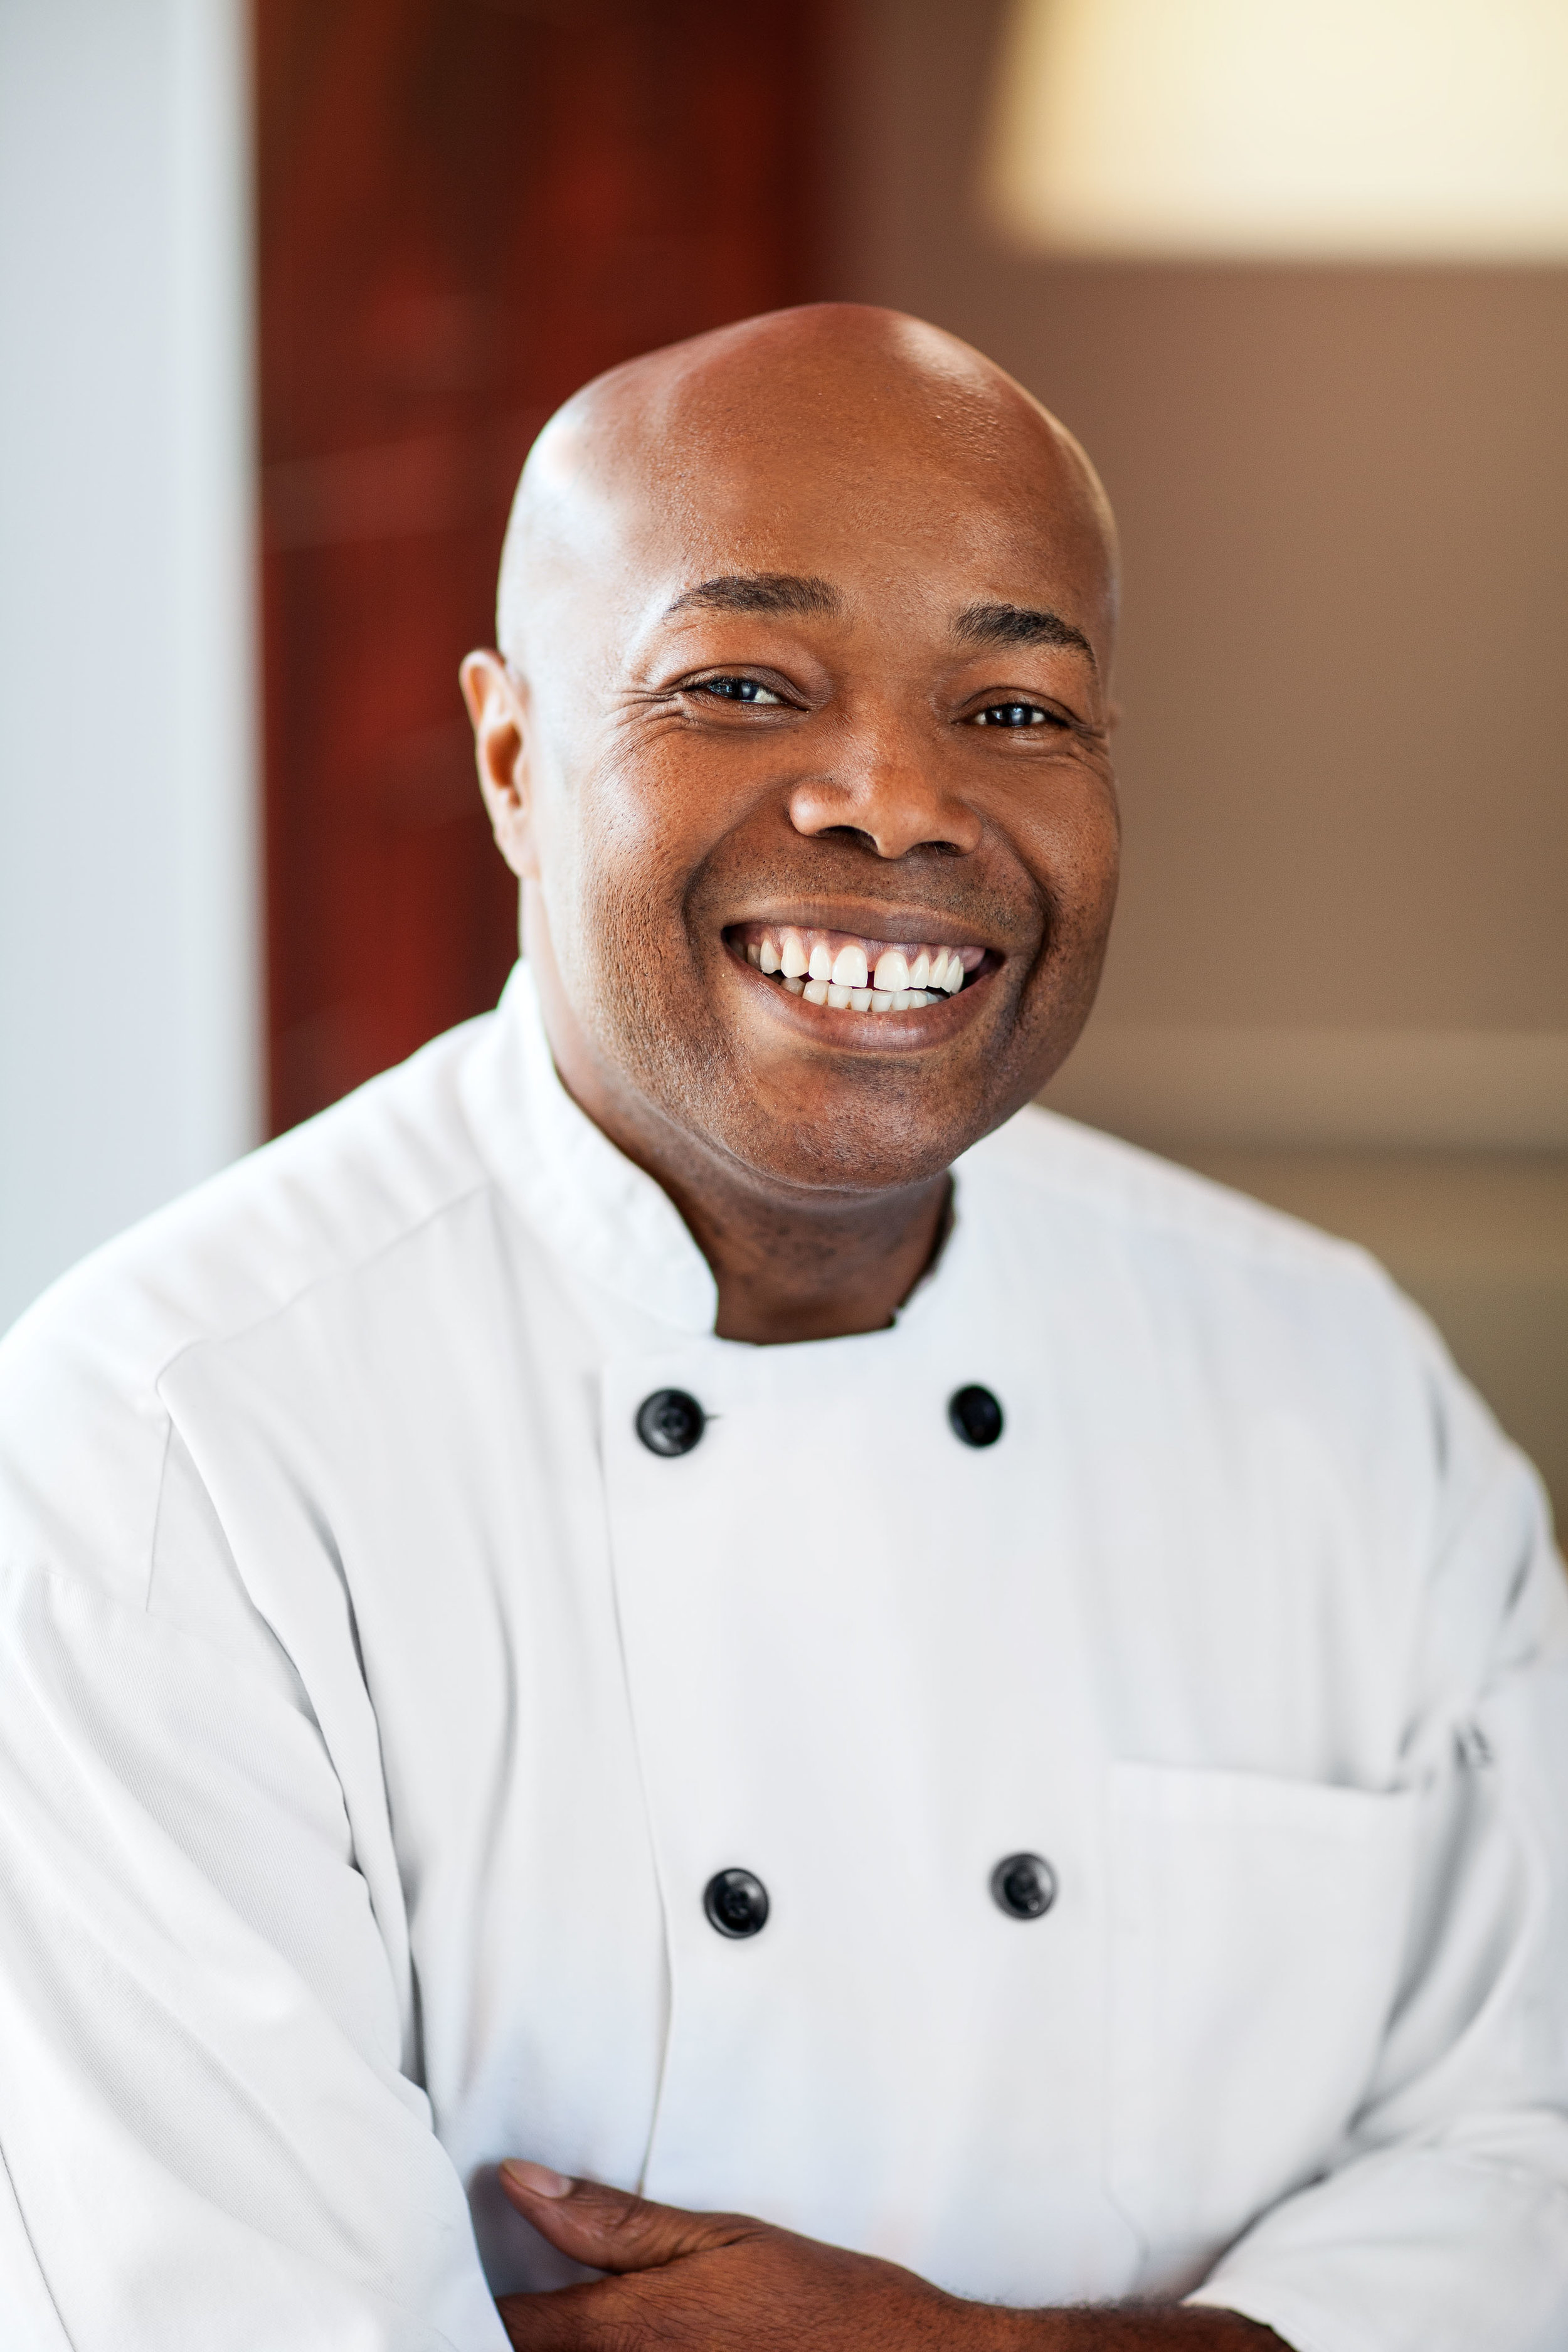 chef_whites_0035.jpg